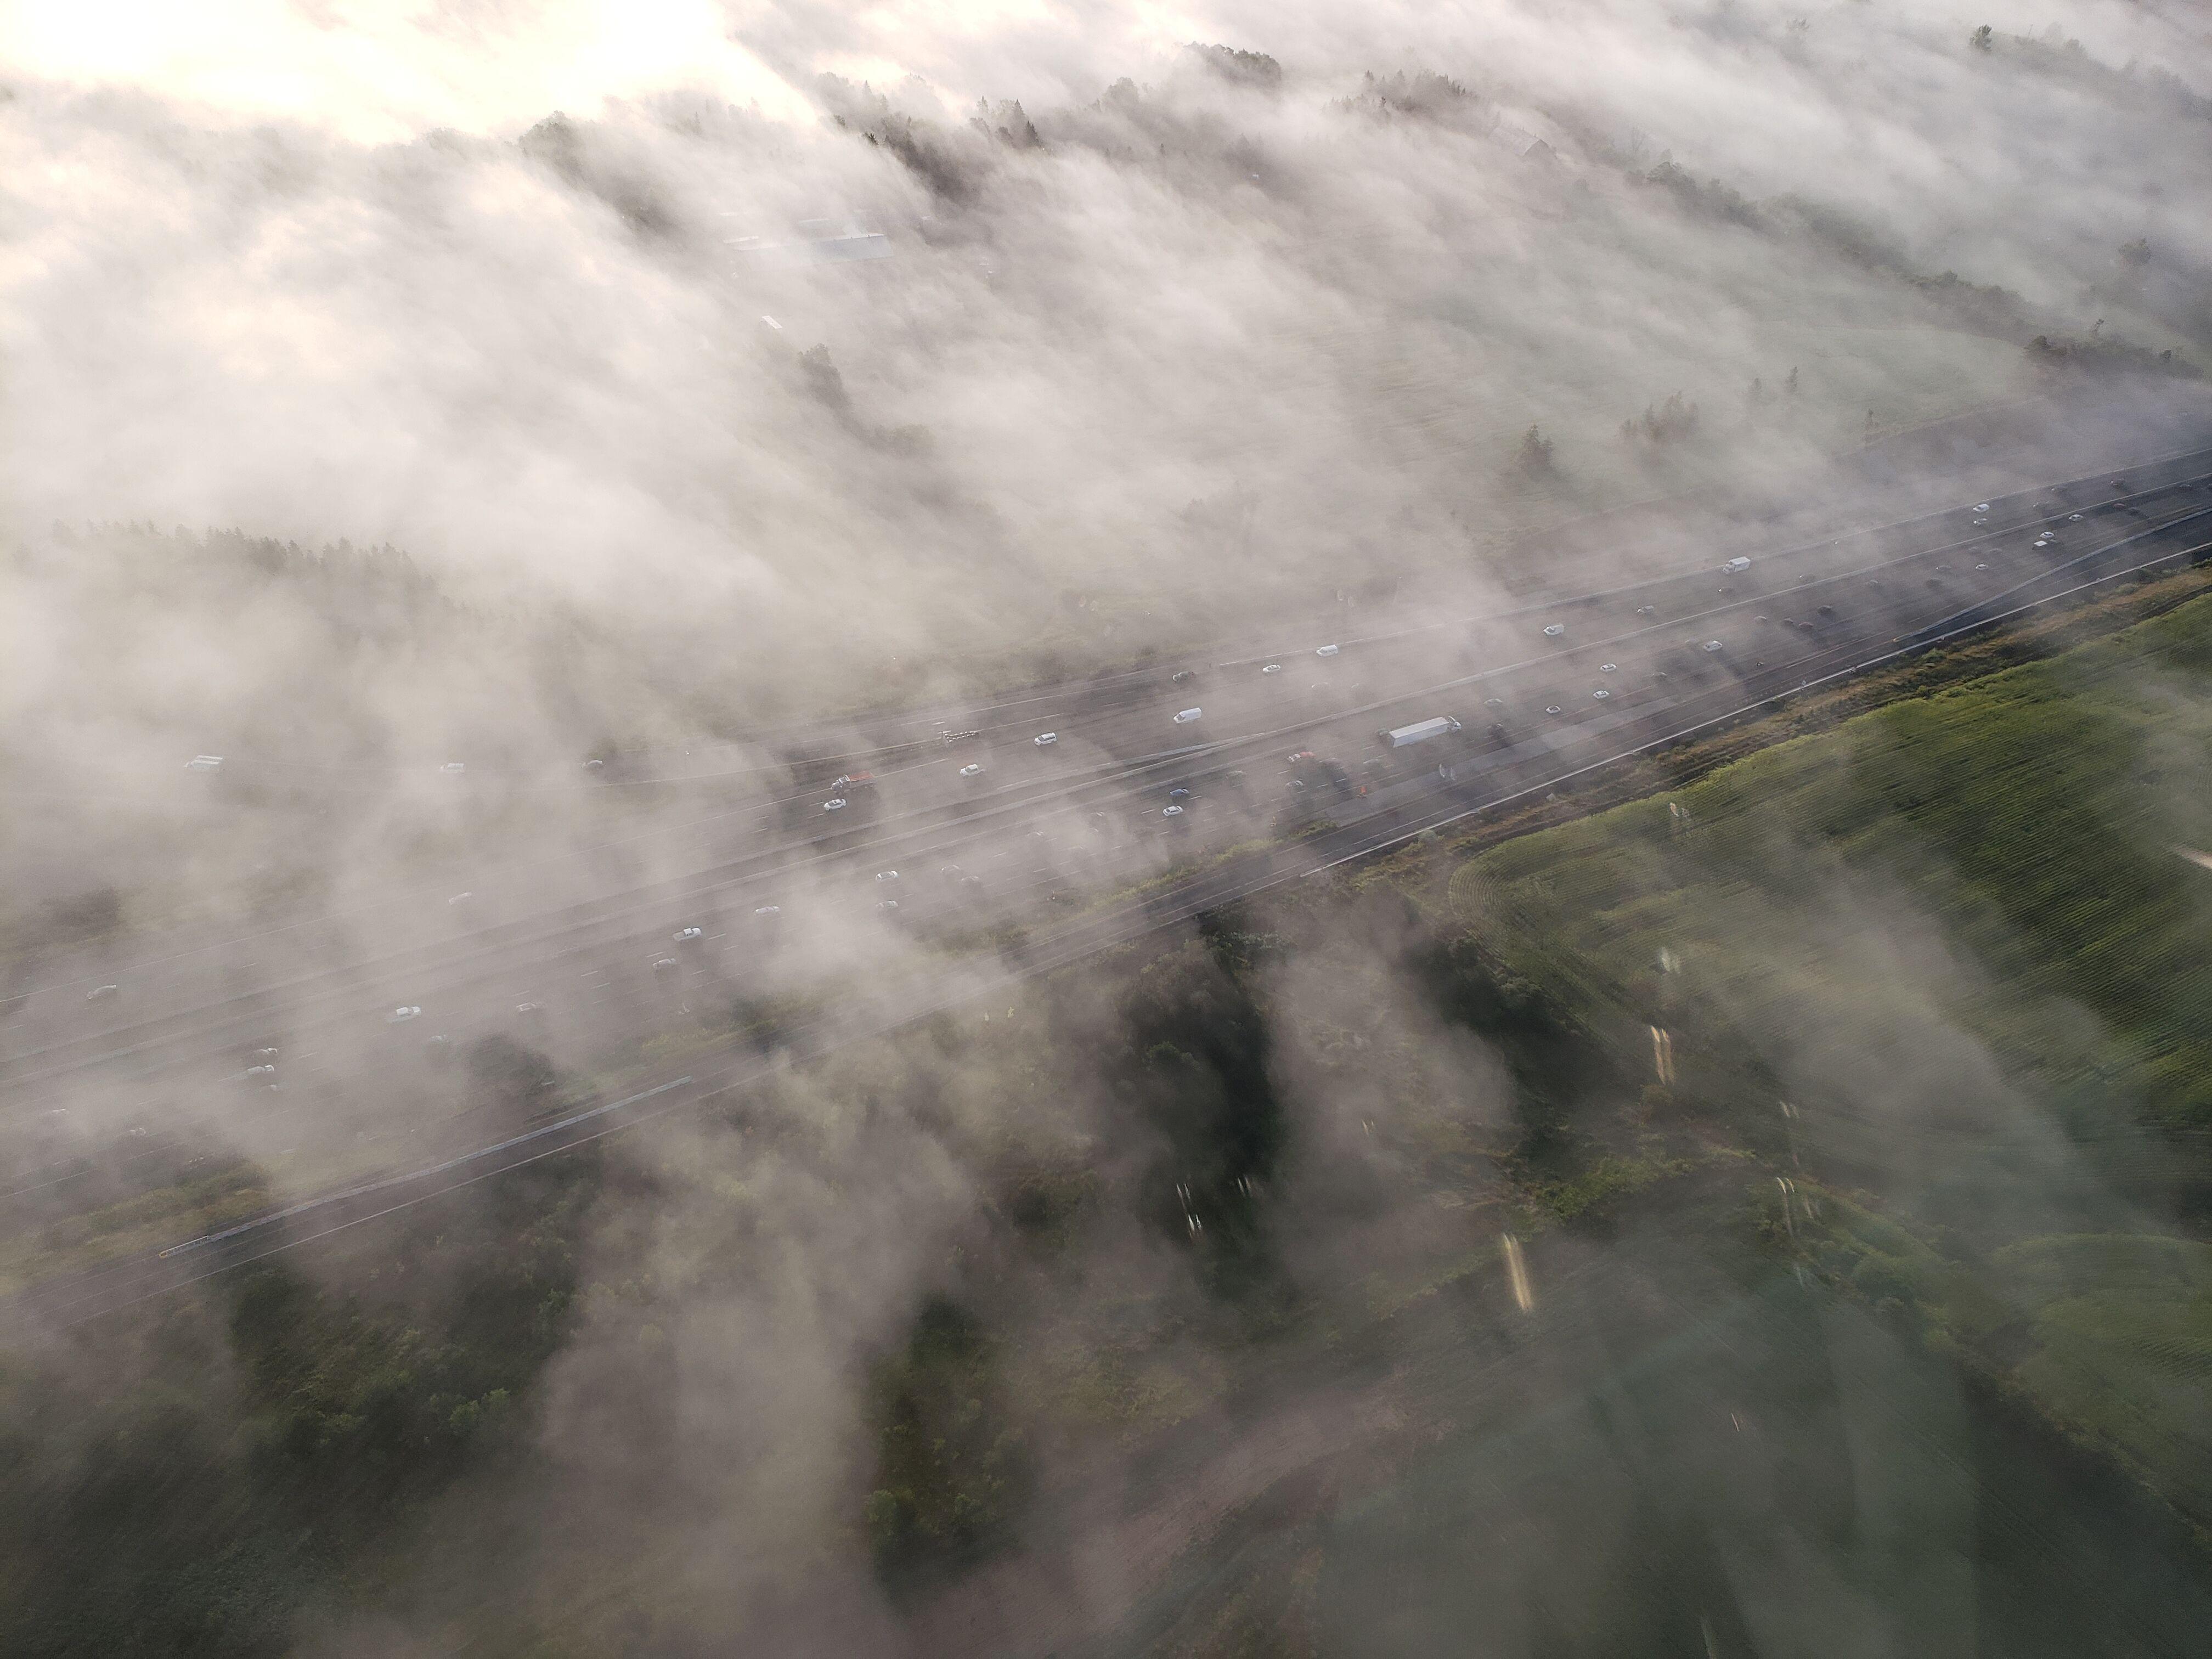 The eye in the sky: Weekly top 5 chopper shots